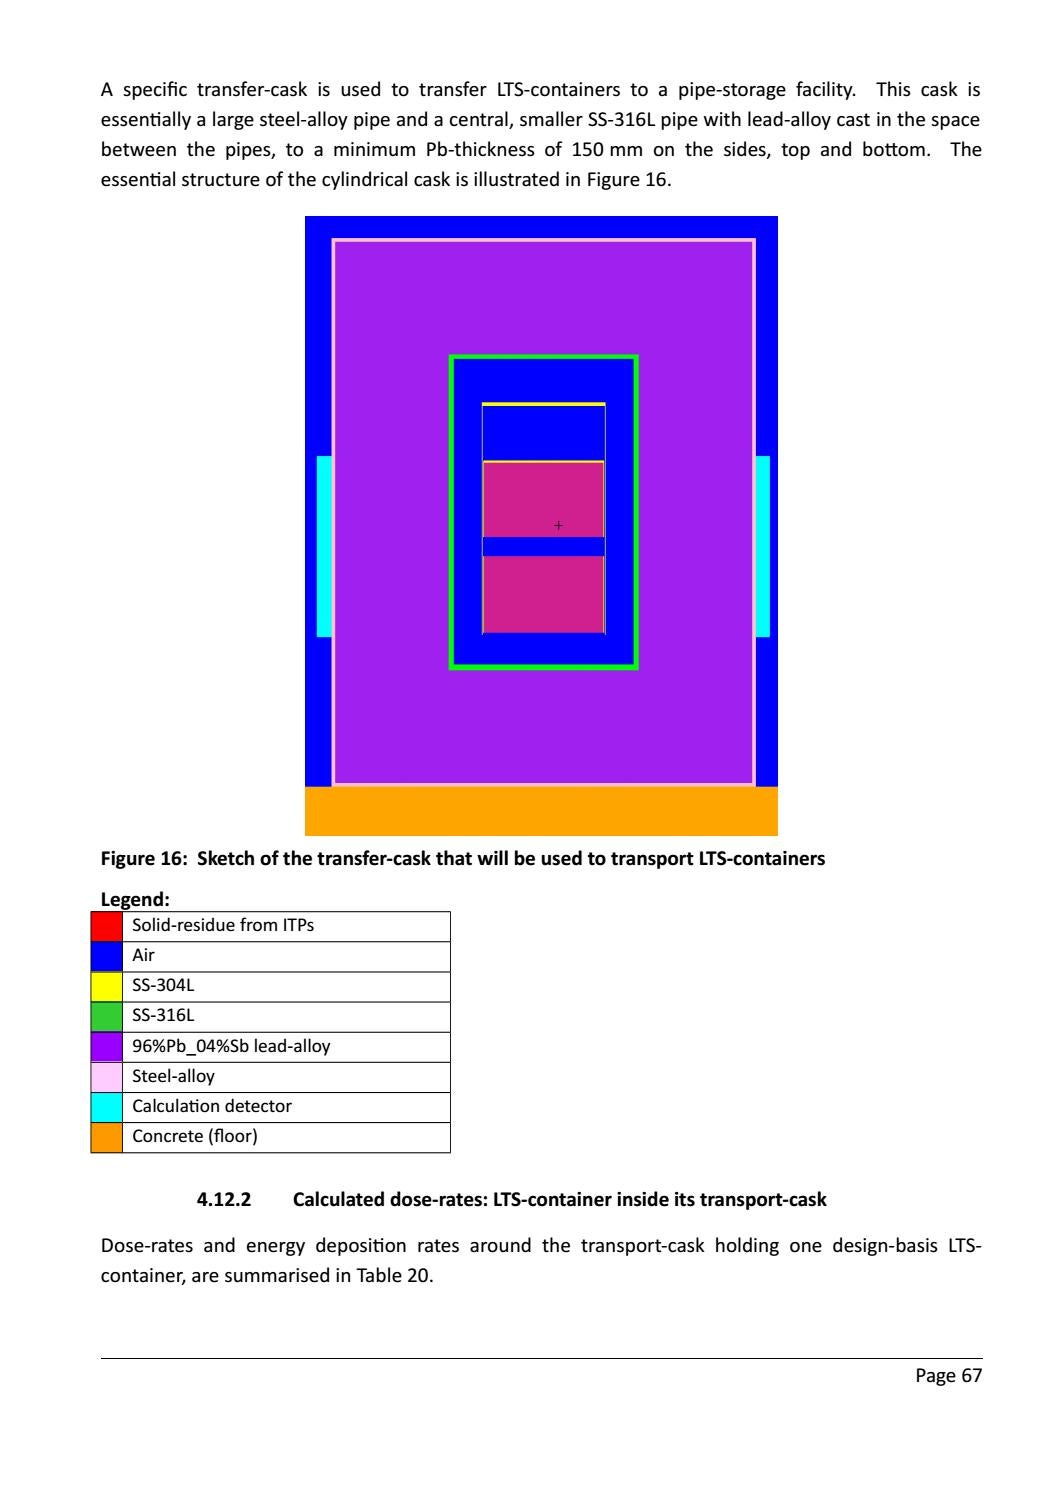 RADIOACTIVE WASTE: COMPUTATIONAL CHARACTERISATION and SHIELDING page 92